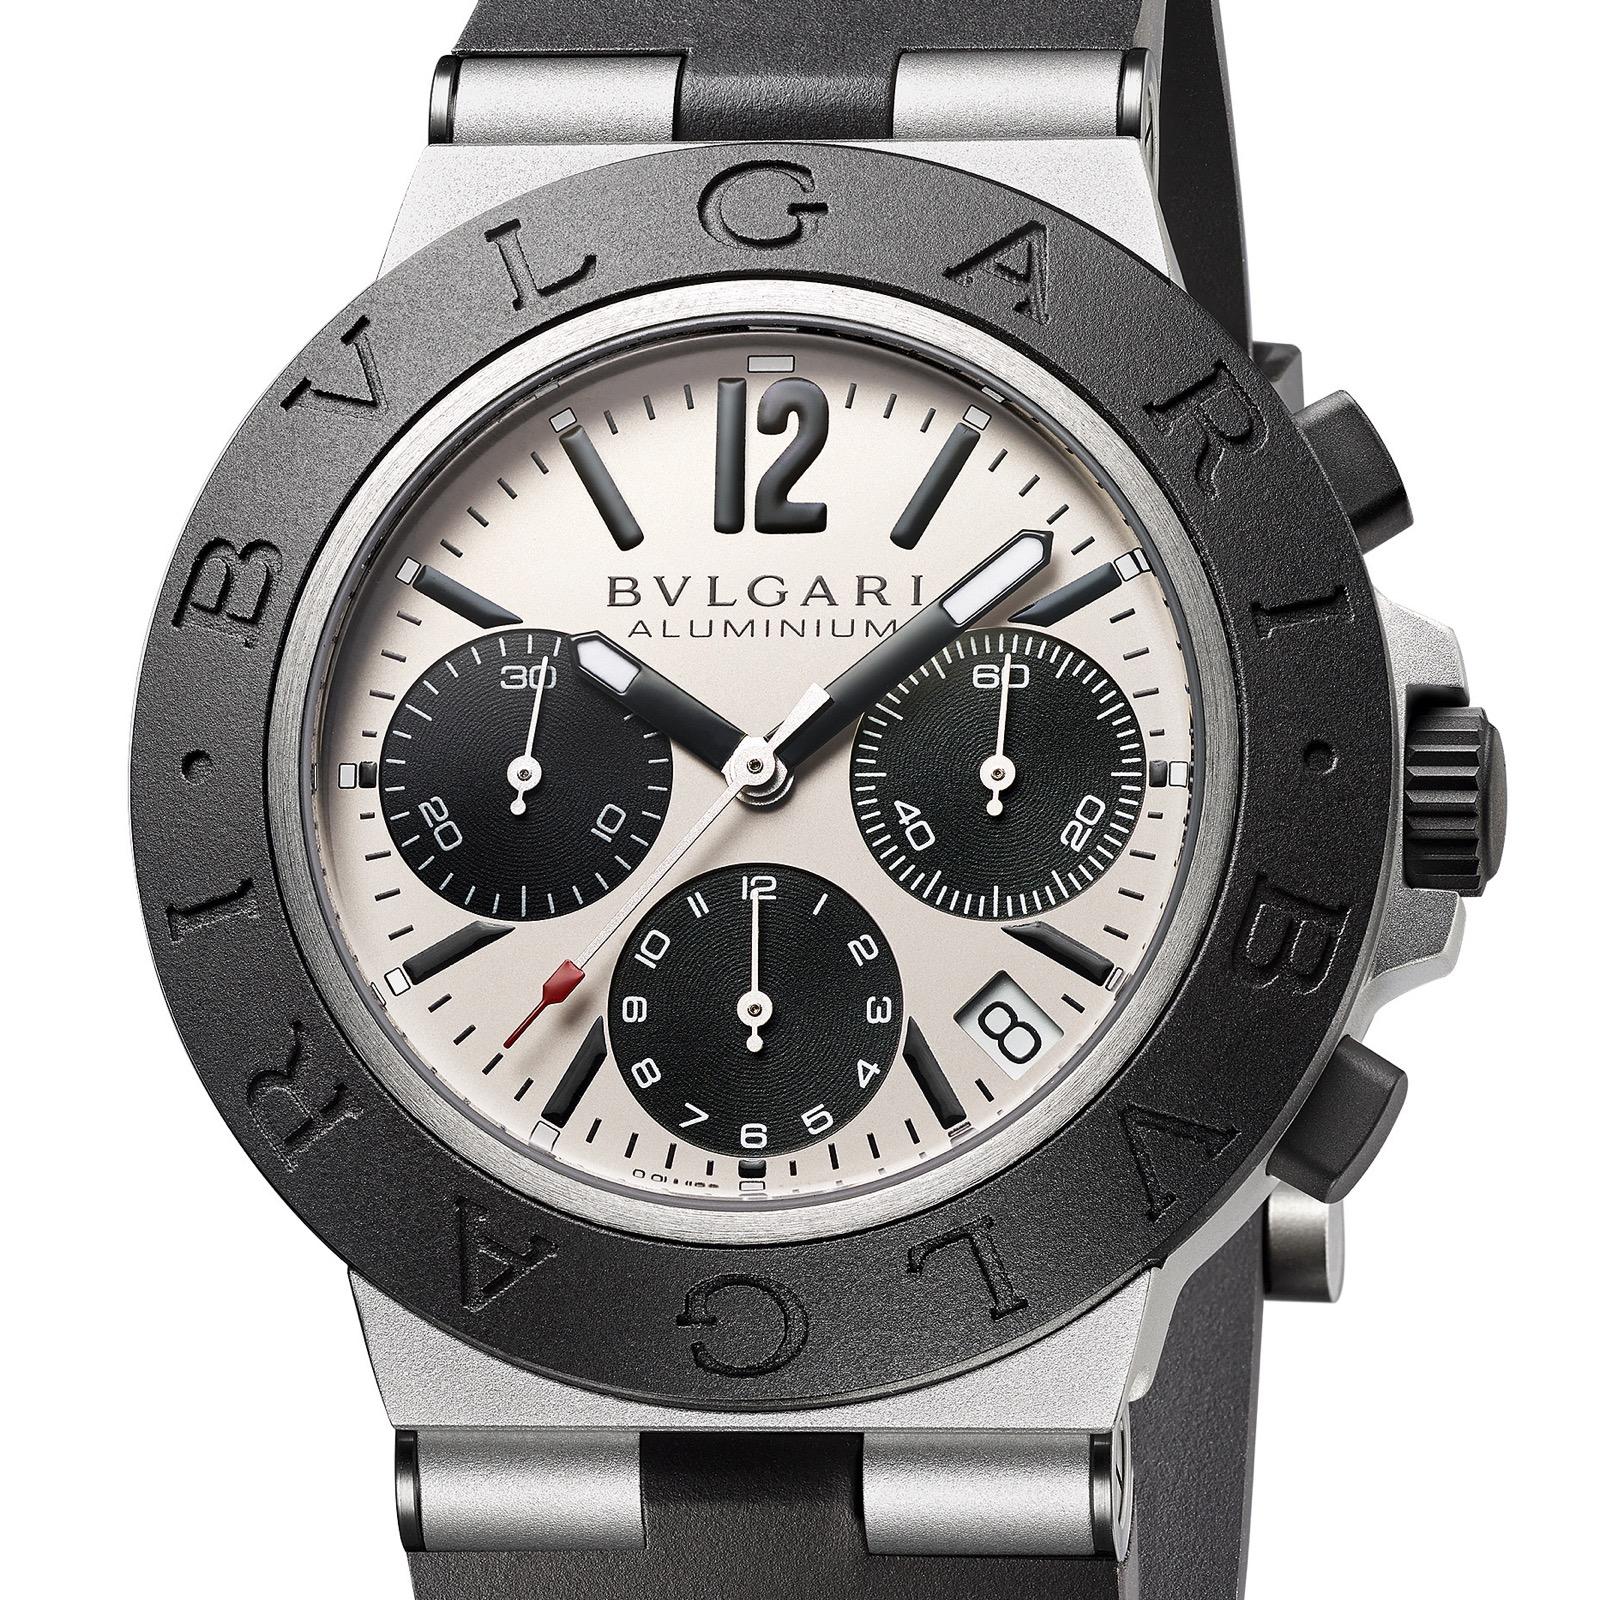 Bulgari - Aluminium Chronograph GPHG